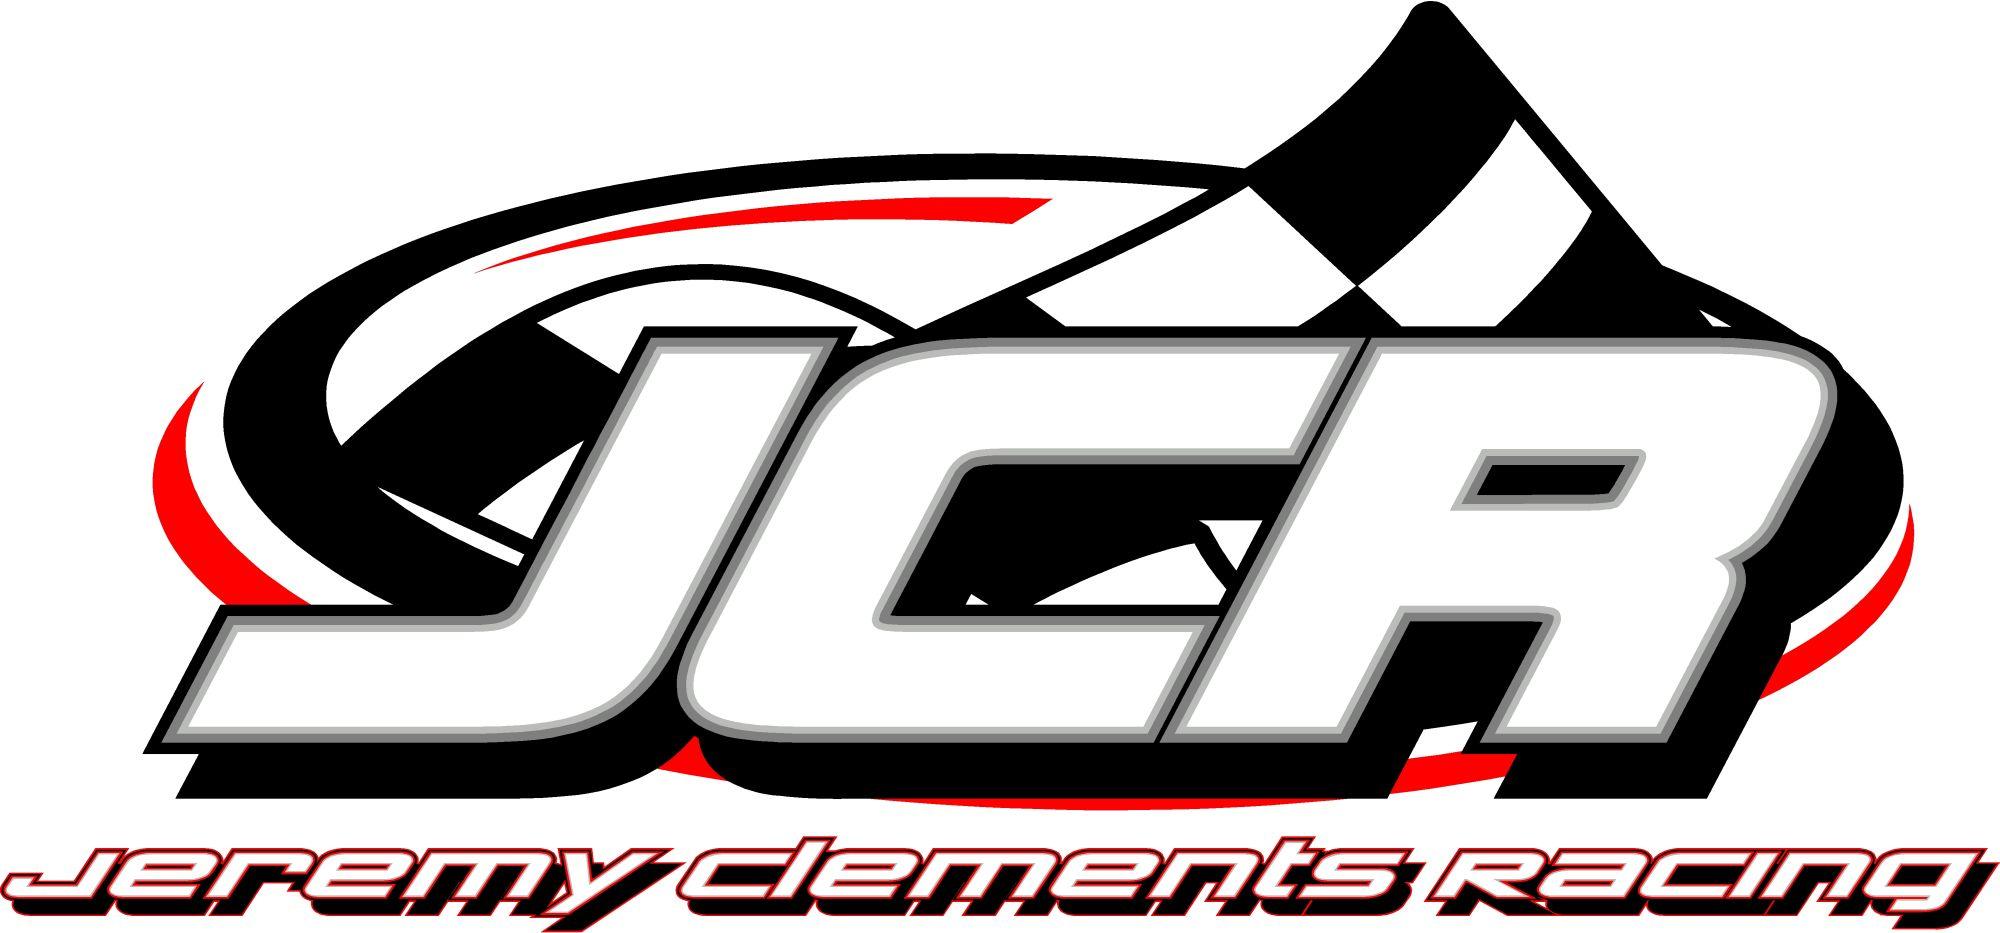 Jeremy-Clements-Racing-Logo.jpg